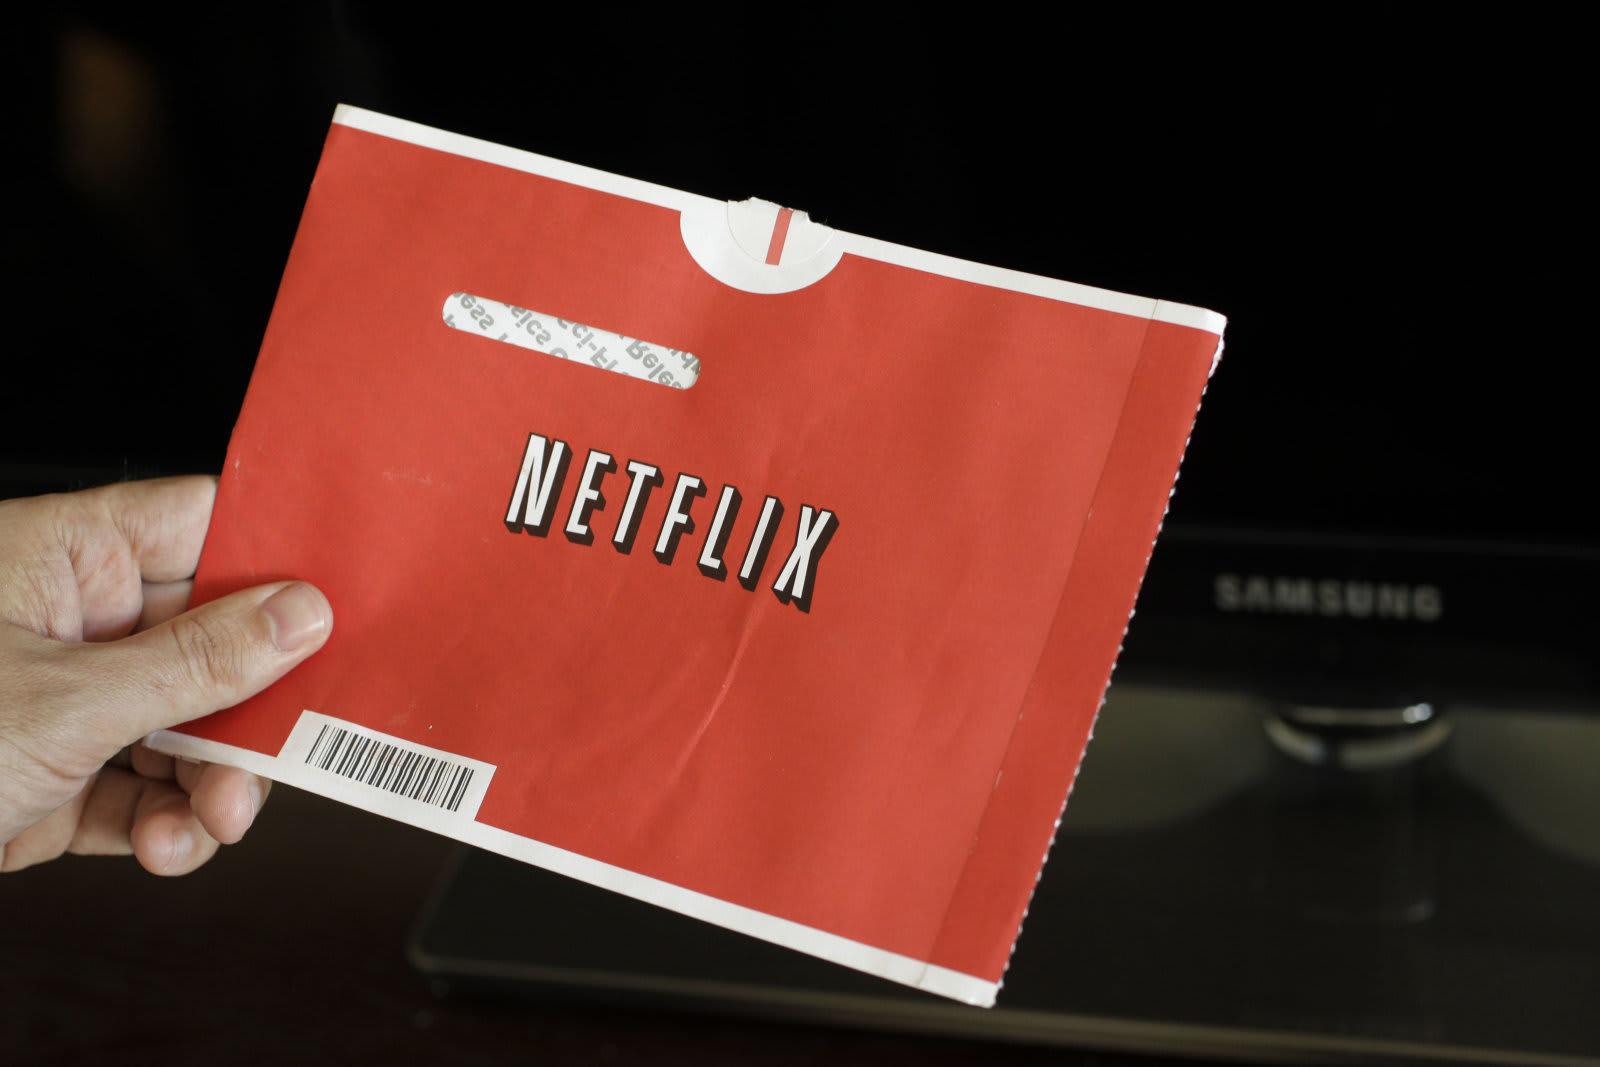 Netflix Disc